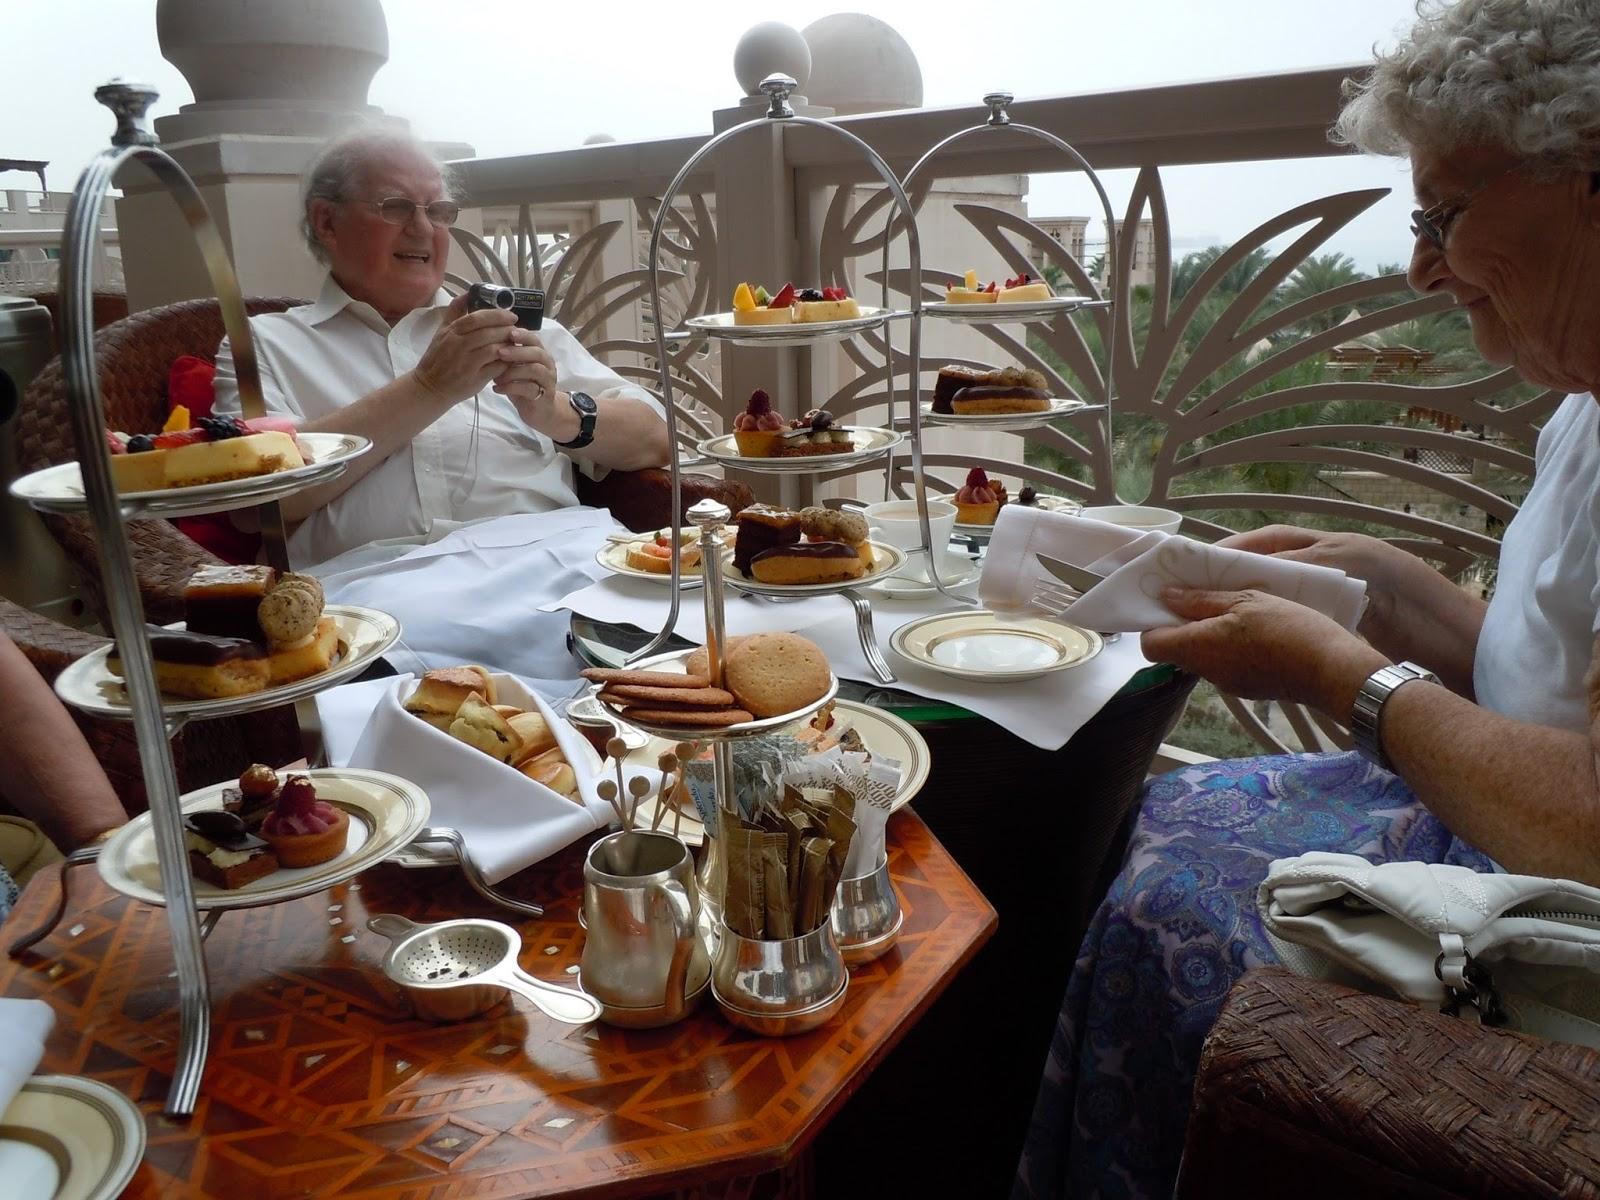 Very Impressive portraiture of Afternoon Tea at Al Qasr with #653F2A color and 1600x1200 pixels